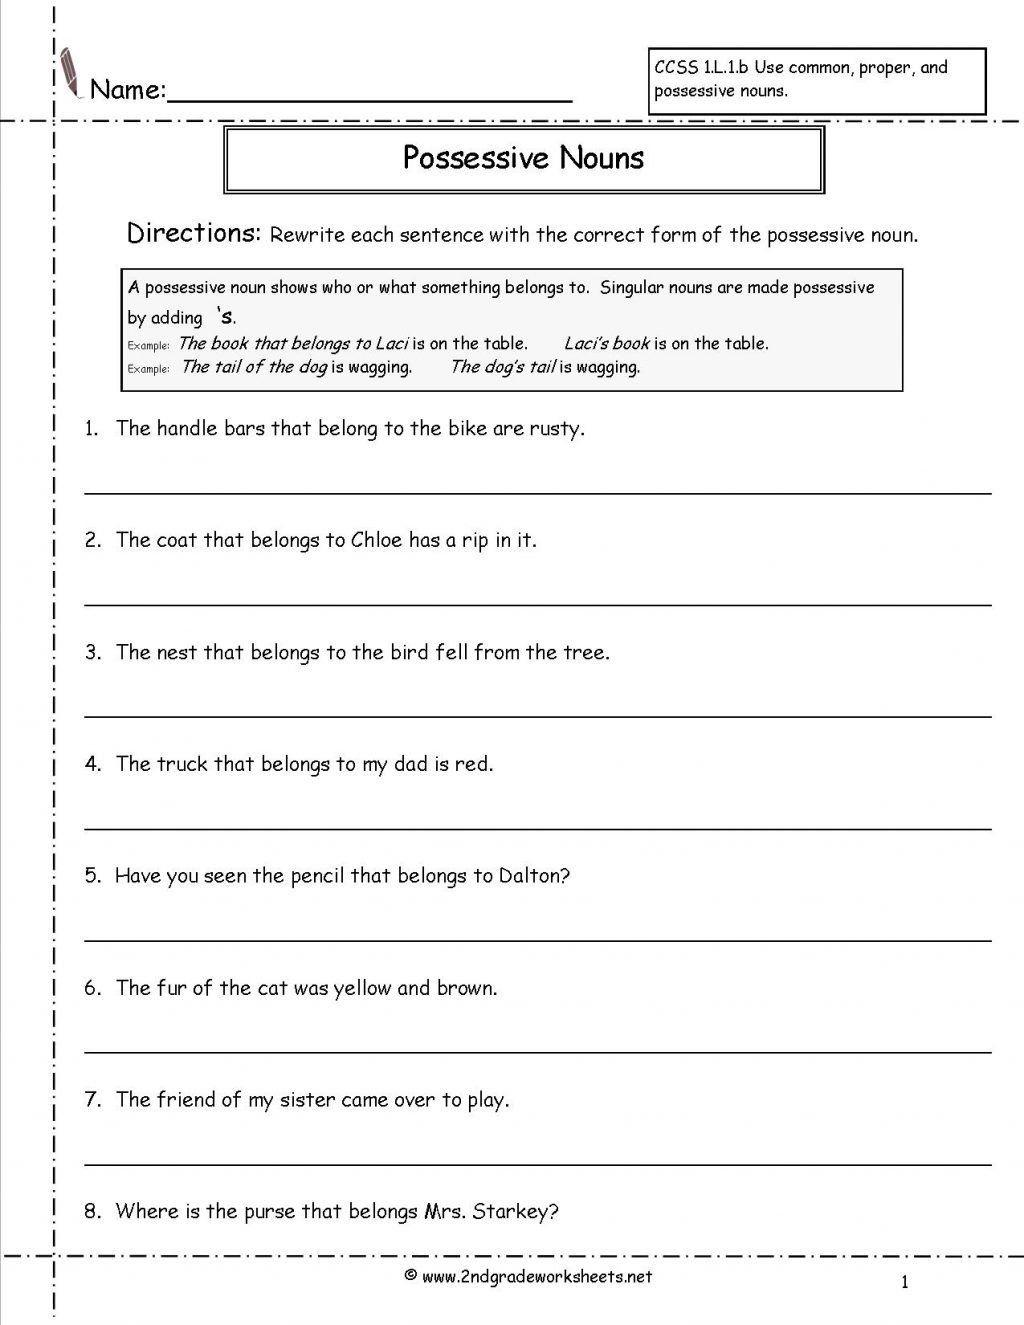 hight resolution of Second Grade Pronoun Worksheets Worksheet Ideas Second Grade Possessive  Nounss astonishi… in 2020   Possessive nouns worksheets